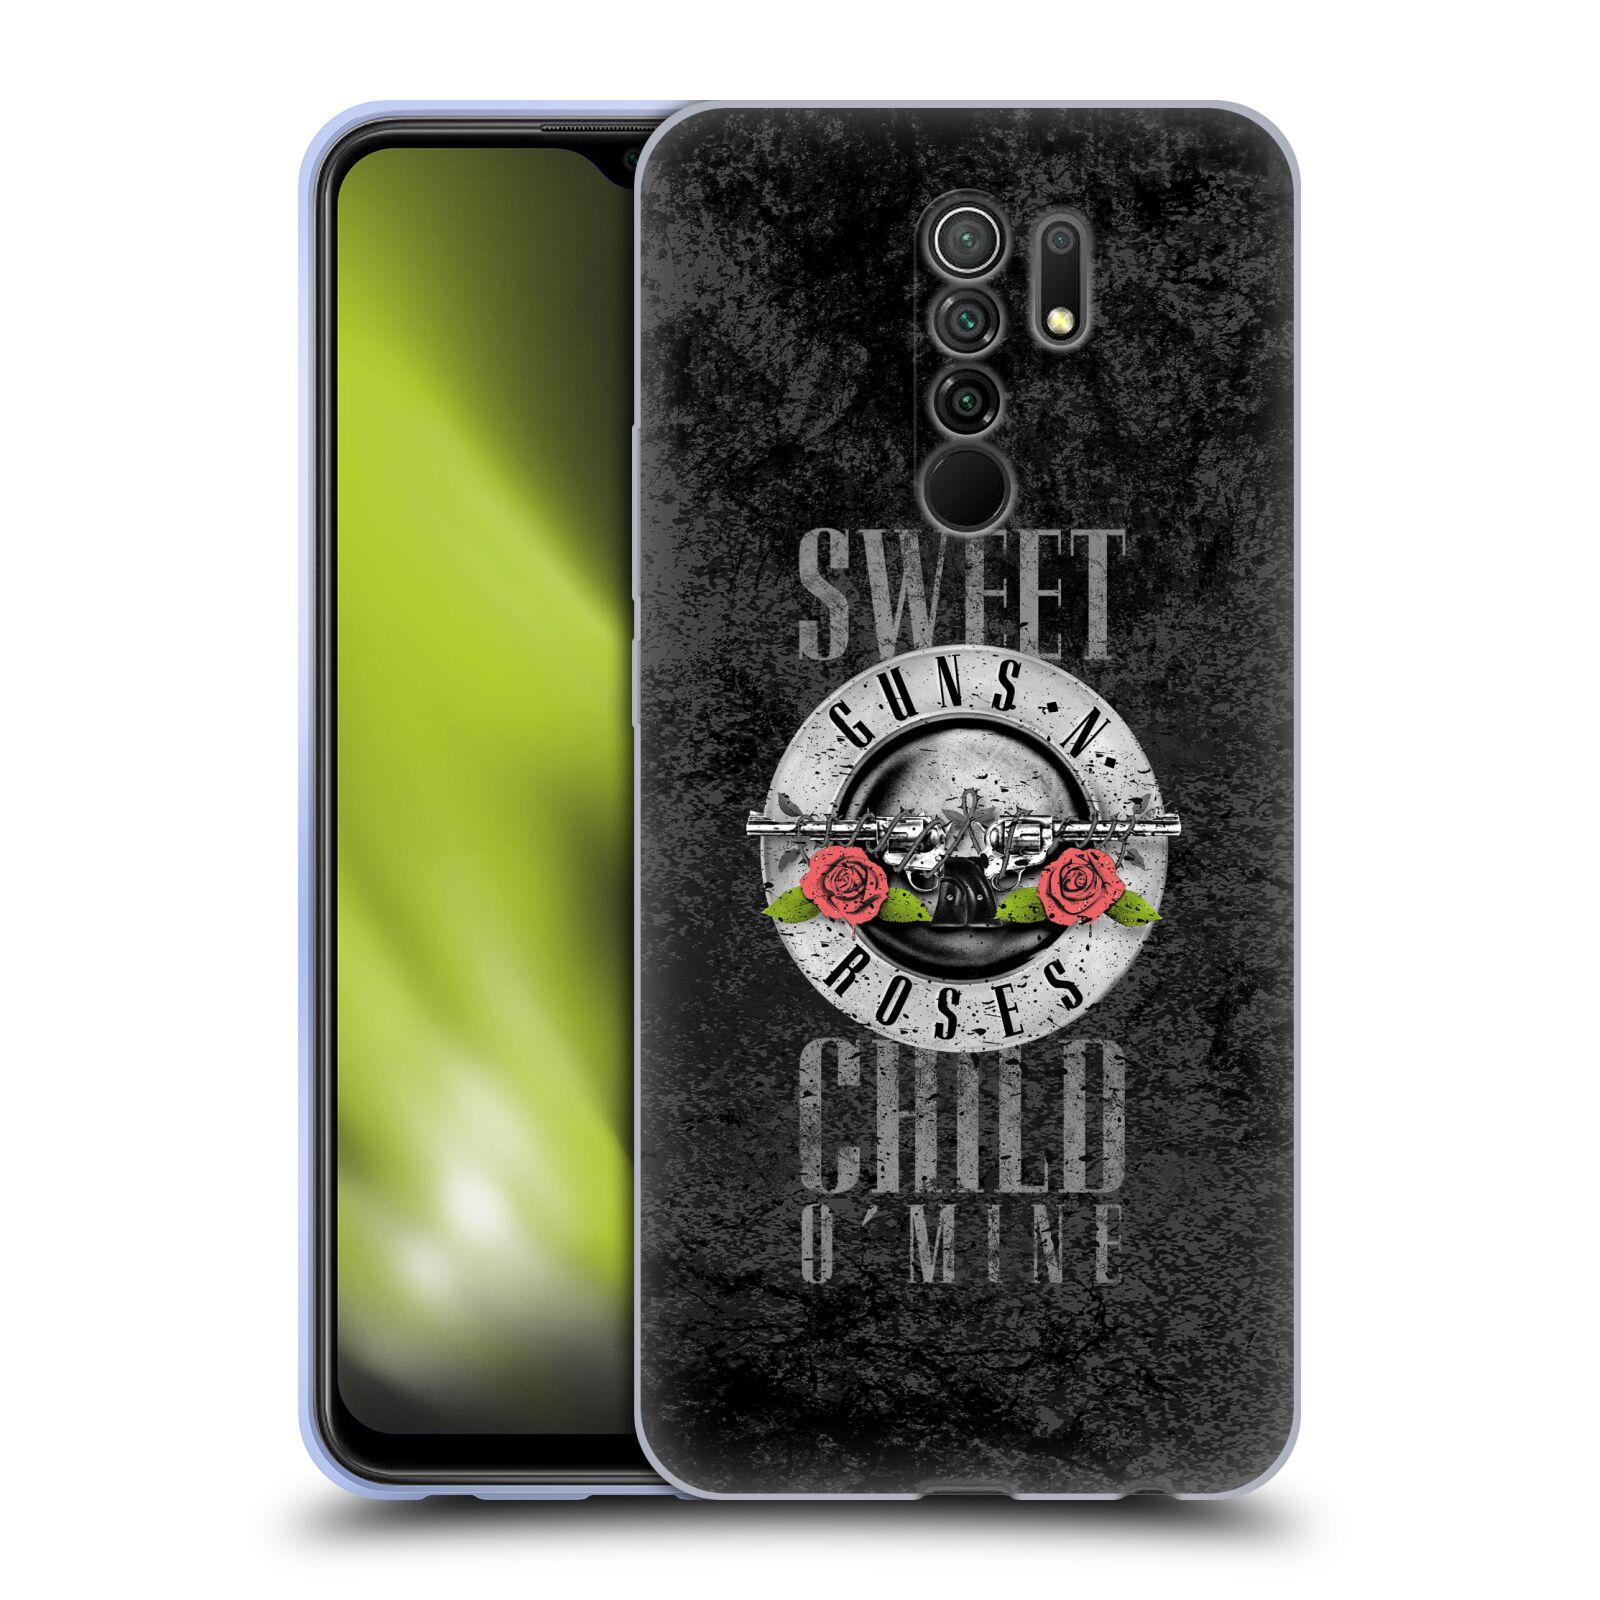 Silikonové pouzdro na mobil Xiaomi Redmi 9 - Head Case - Guns N' Roses - Sweet Child